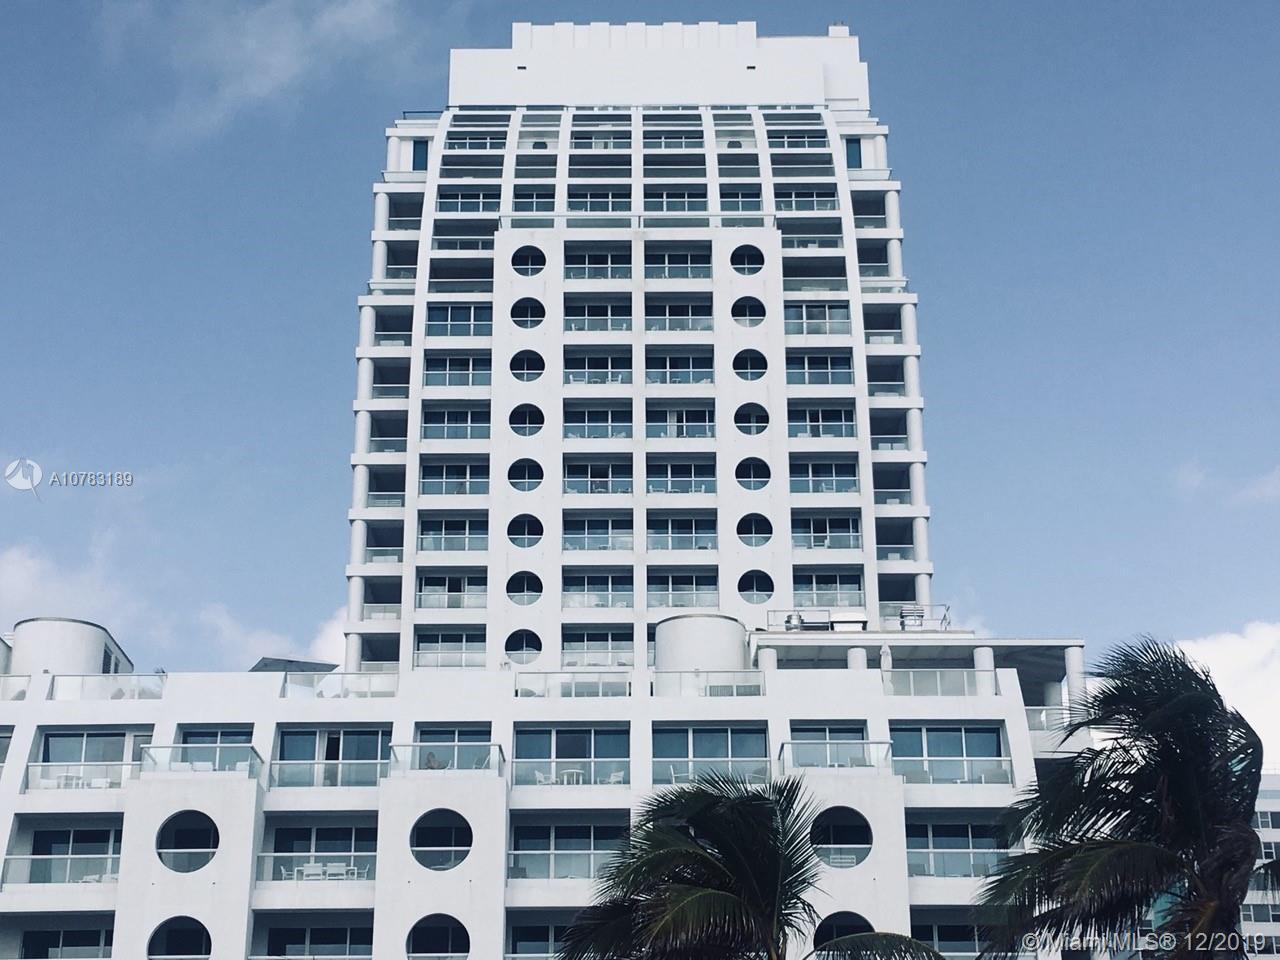 The Ocean Resort, 551 N Fort Lauderdale Beach Blvd Unit H1510, Fort Lauderdale, Florida 33304